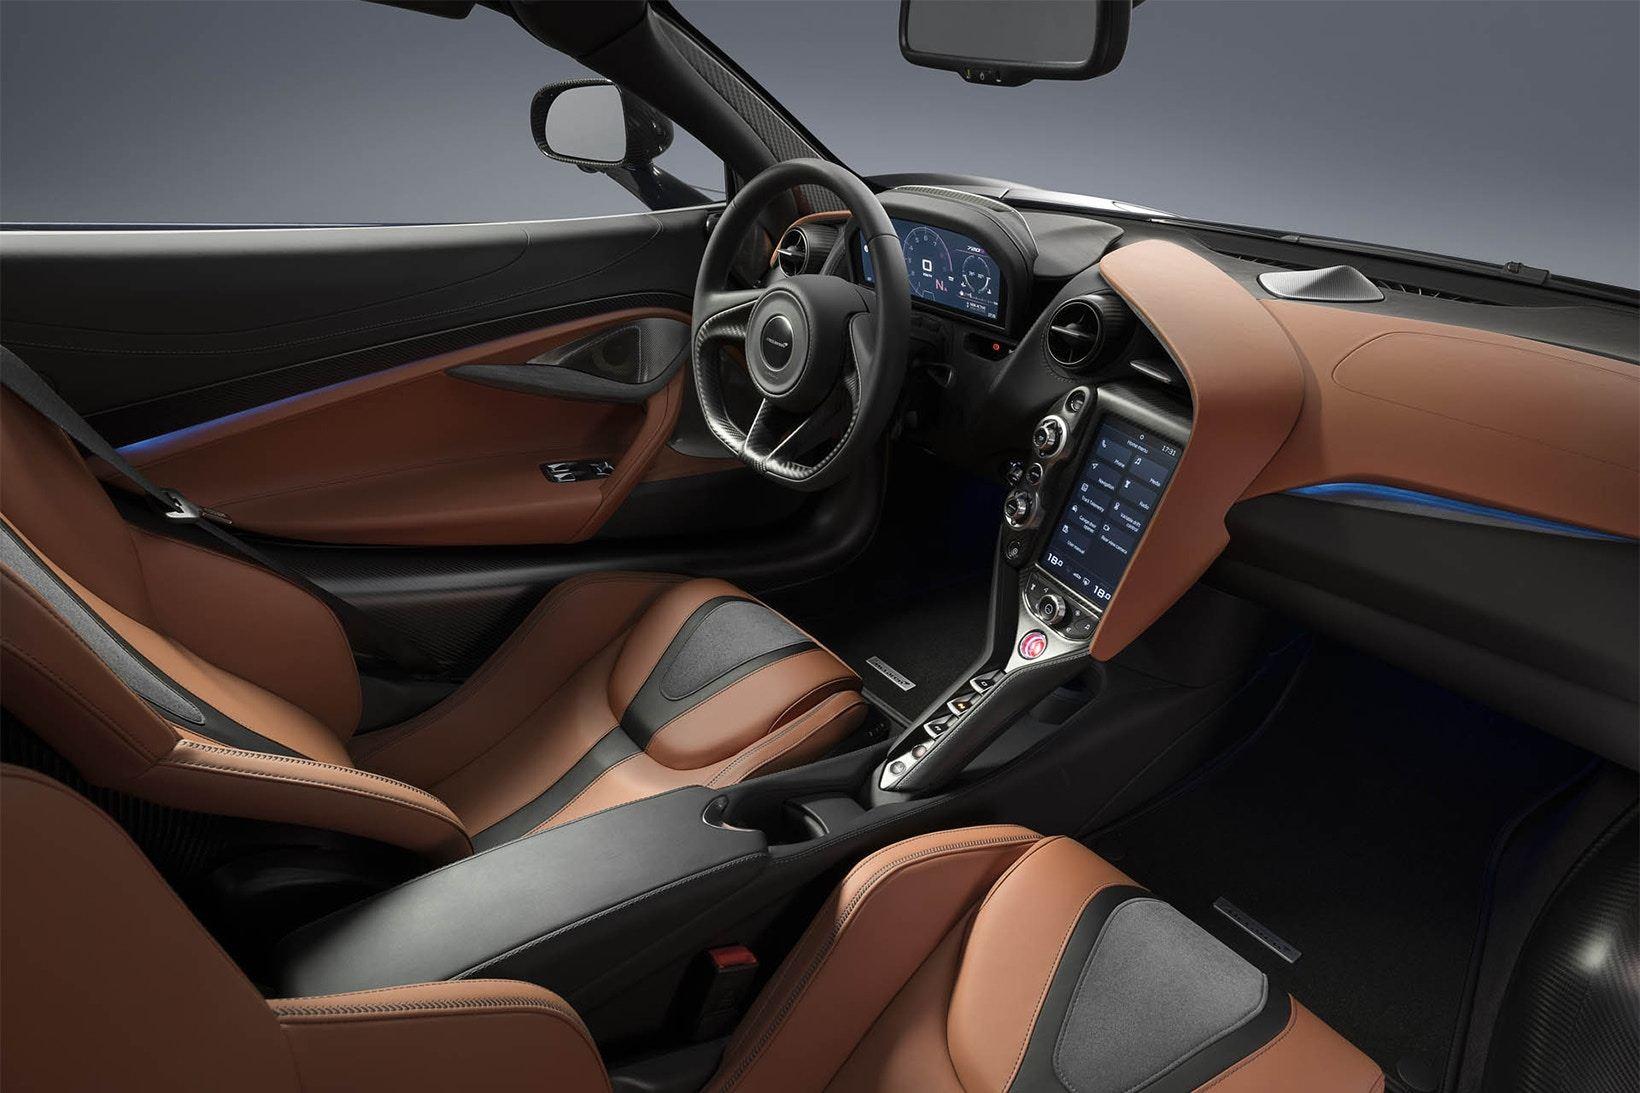 McLaren 720S MSO「Atlantic Blue」特别定制,惊艳登场!-烽巢网